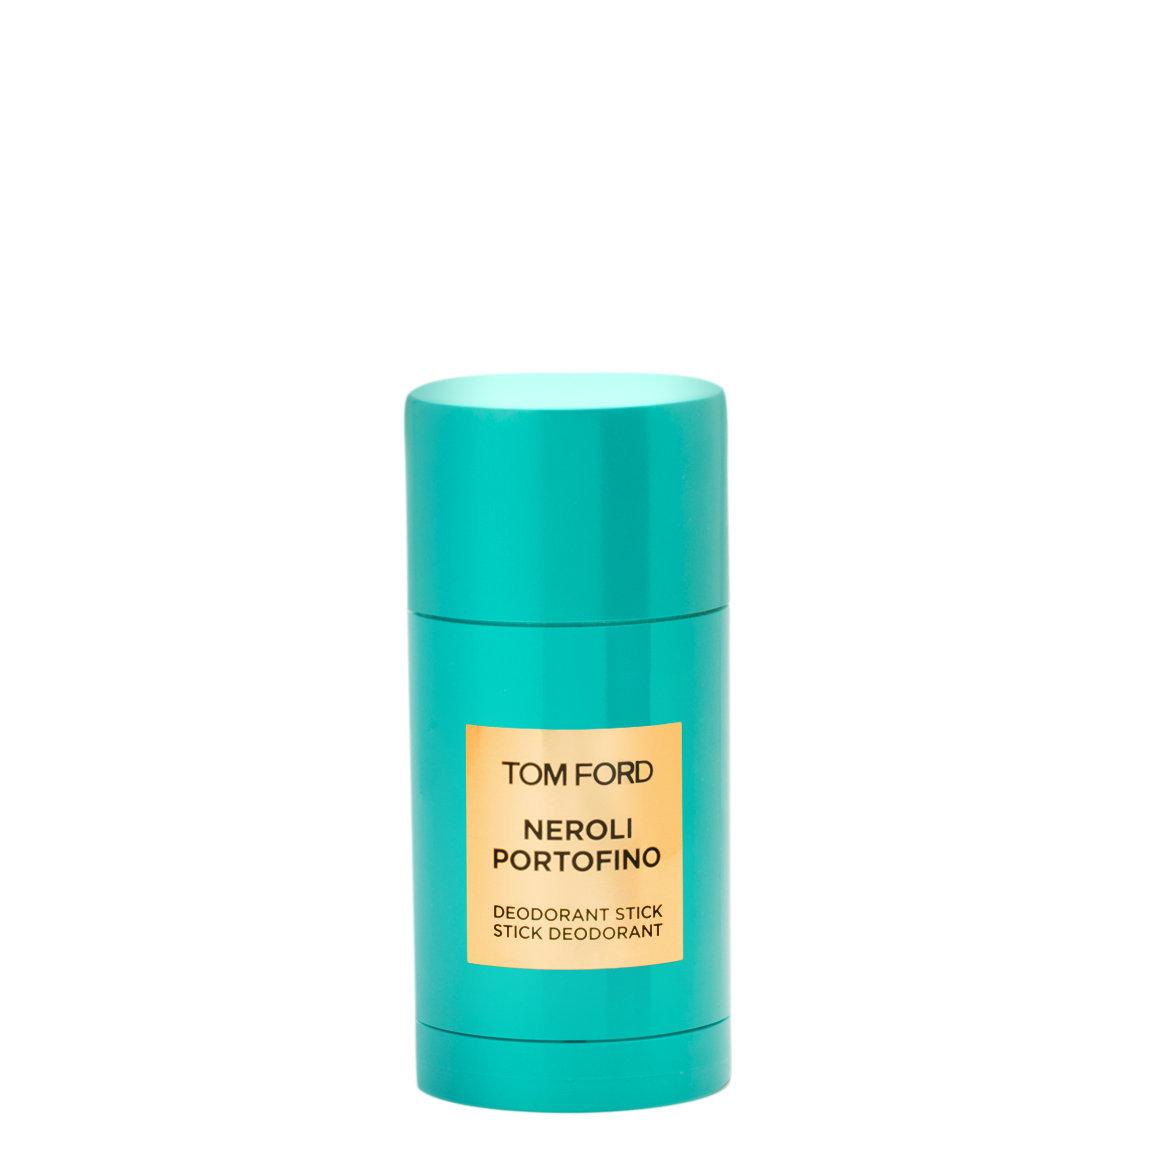 TOM FORD Neroli Portofino Deodorant Stick product swatch.